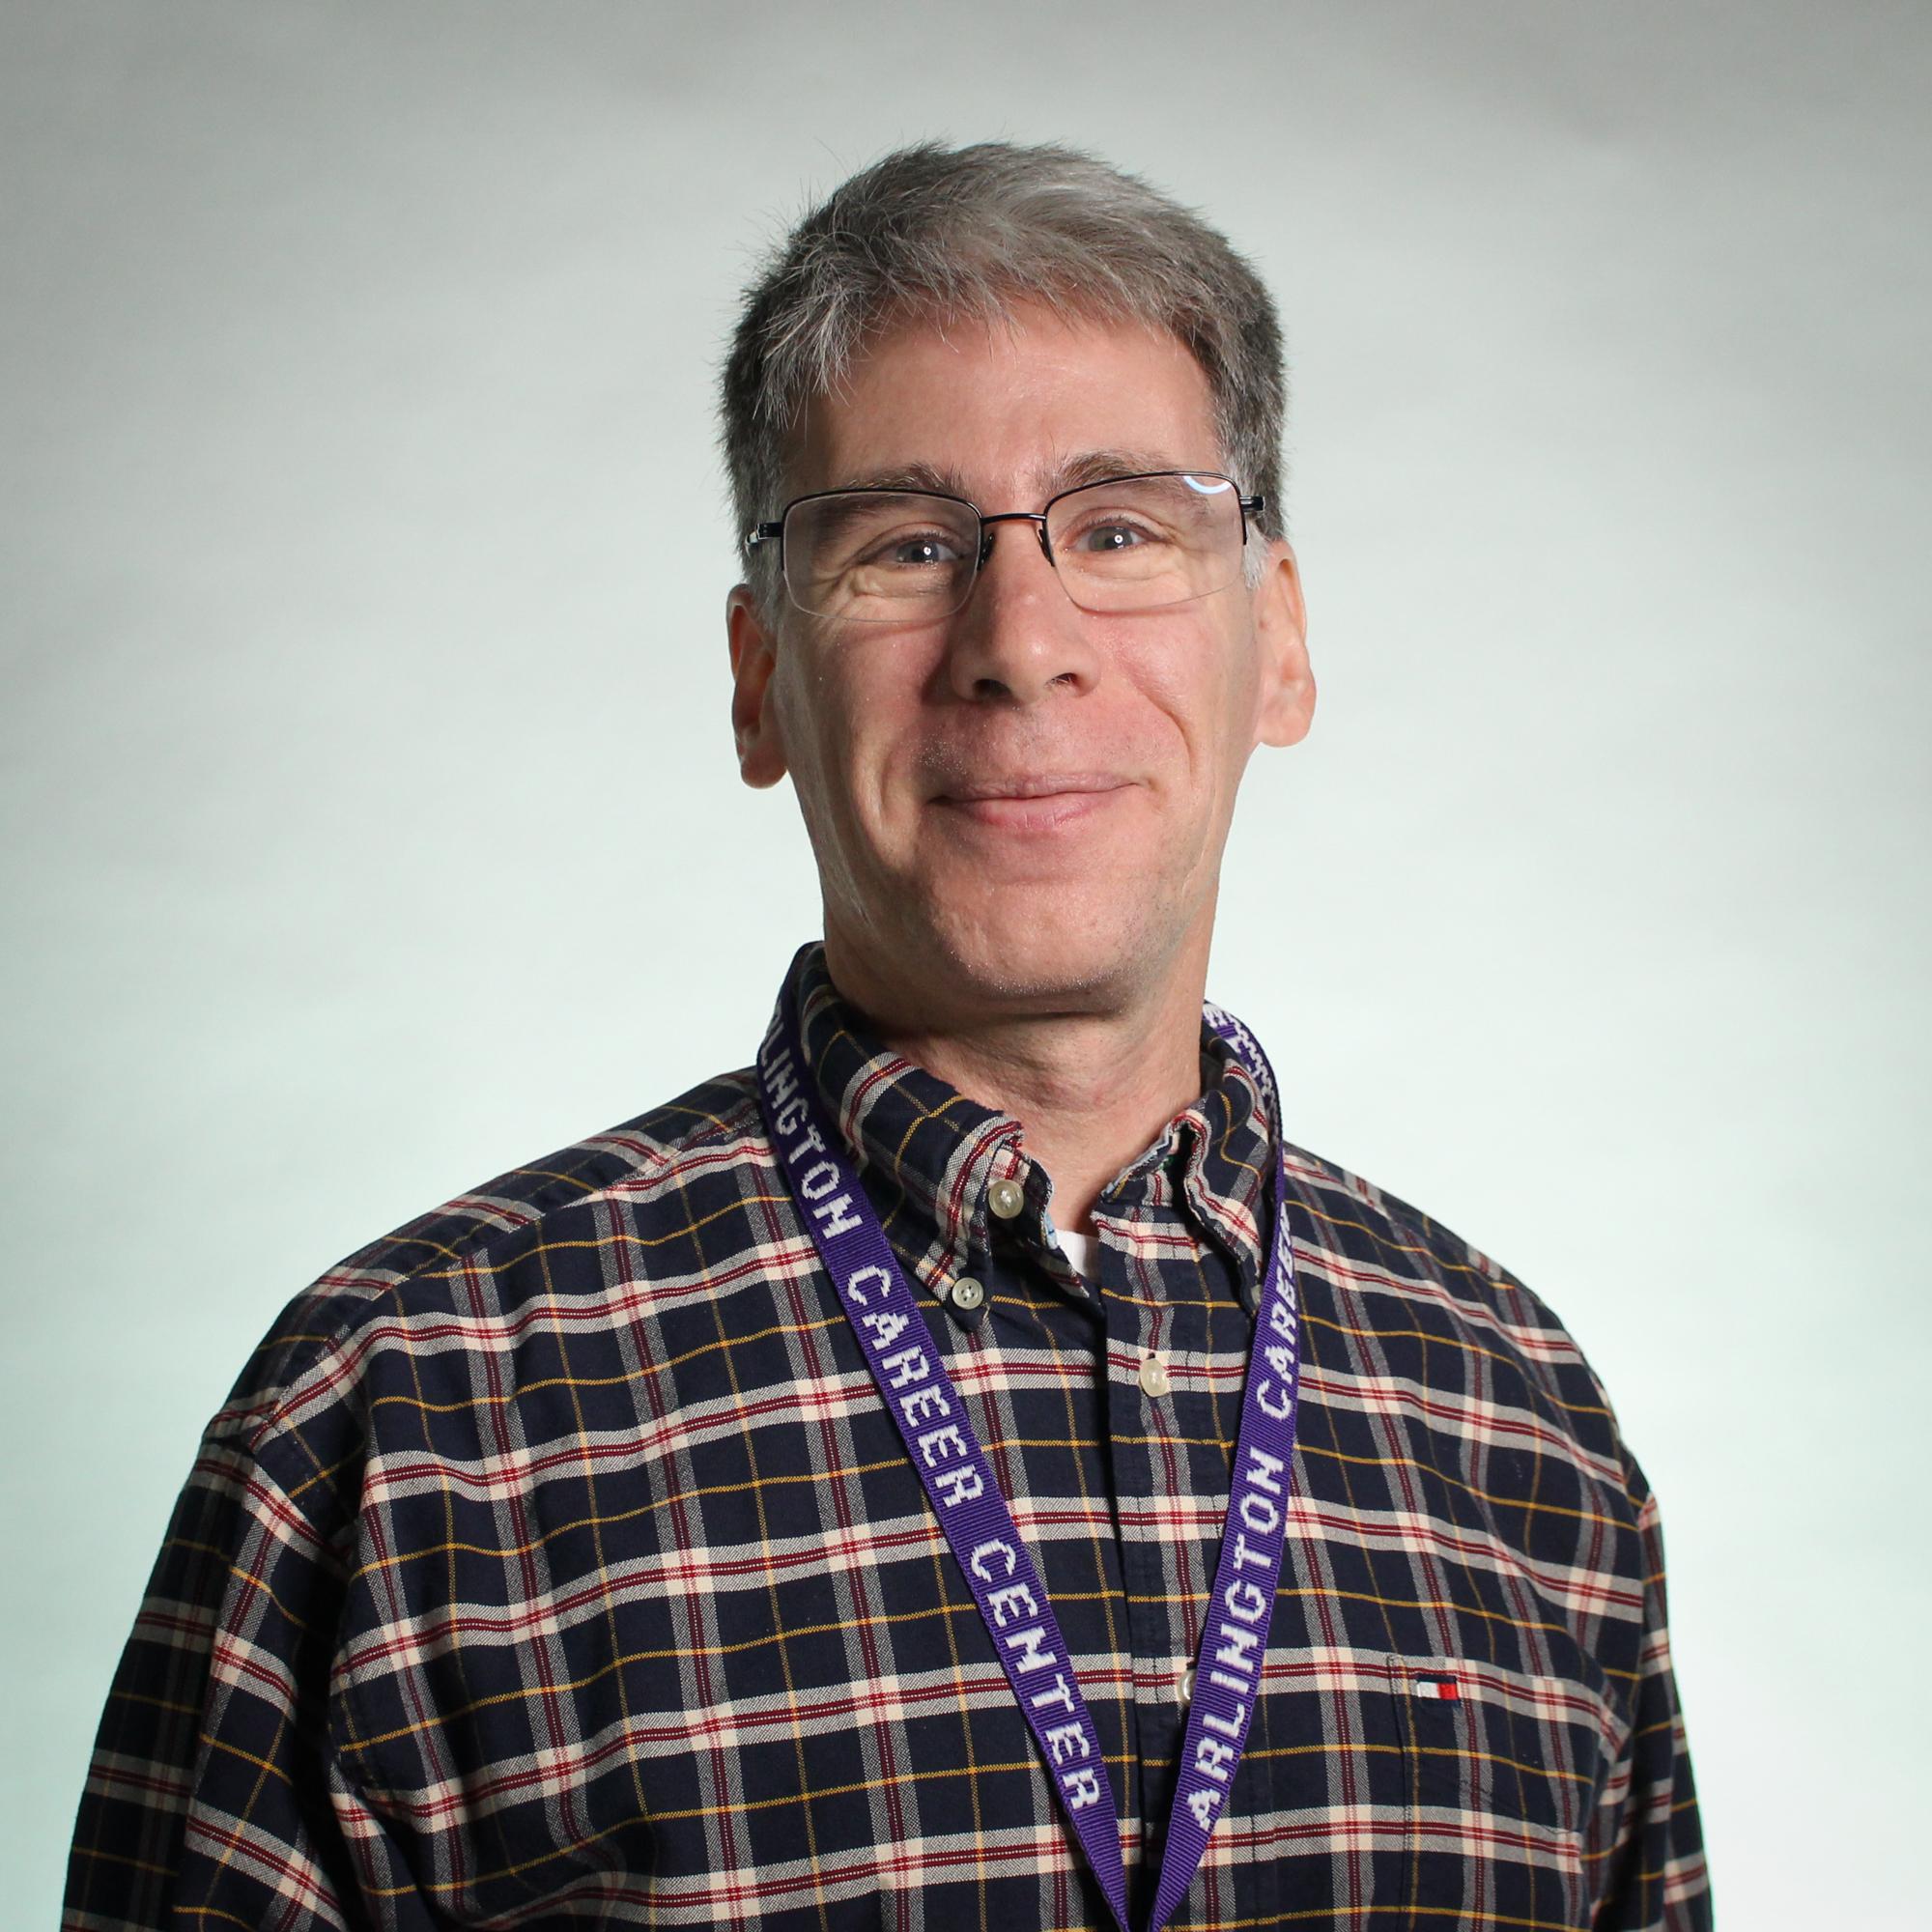 Sr. Joe Rubenstein